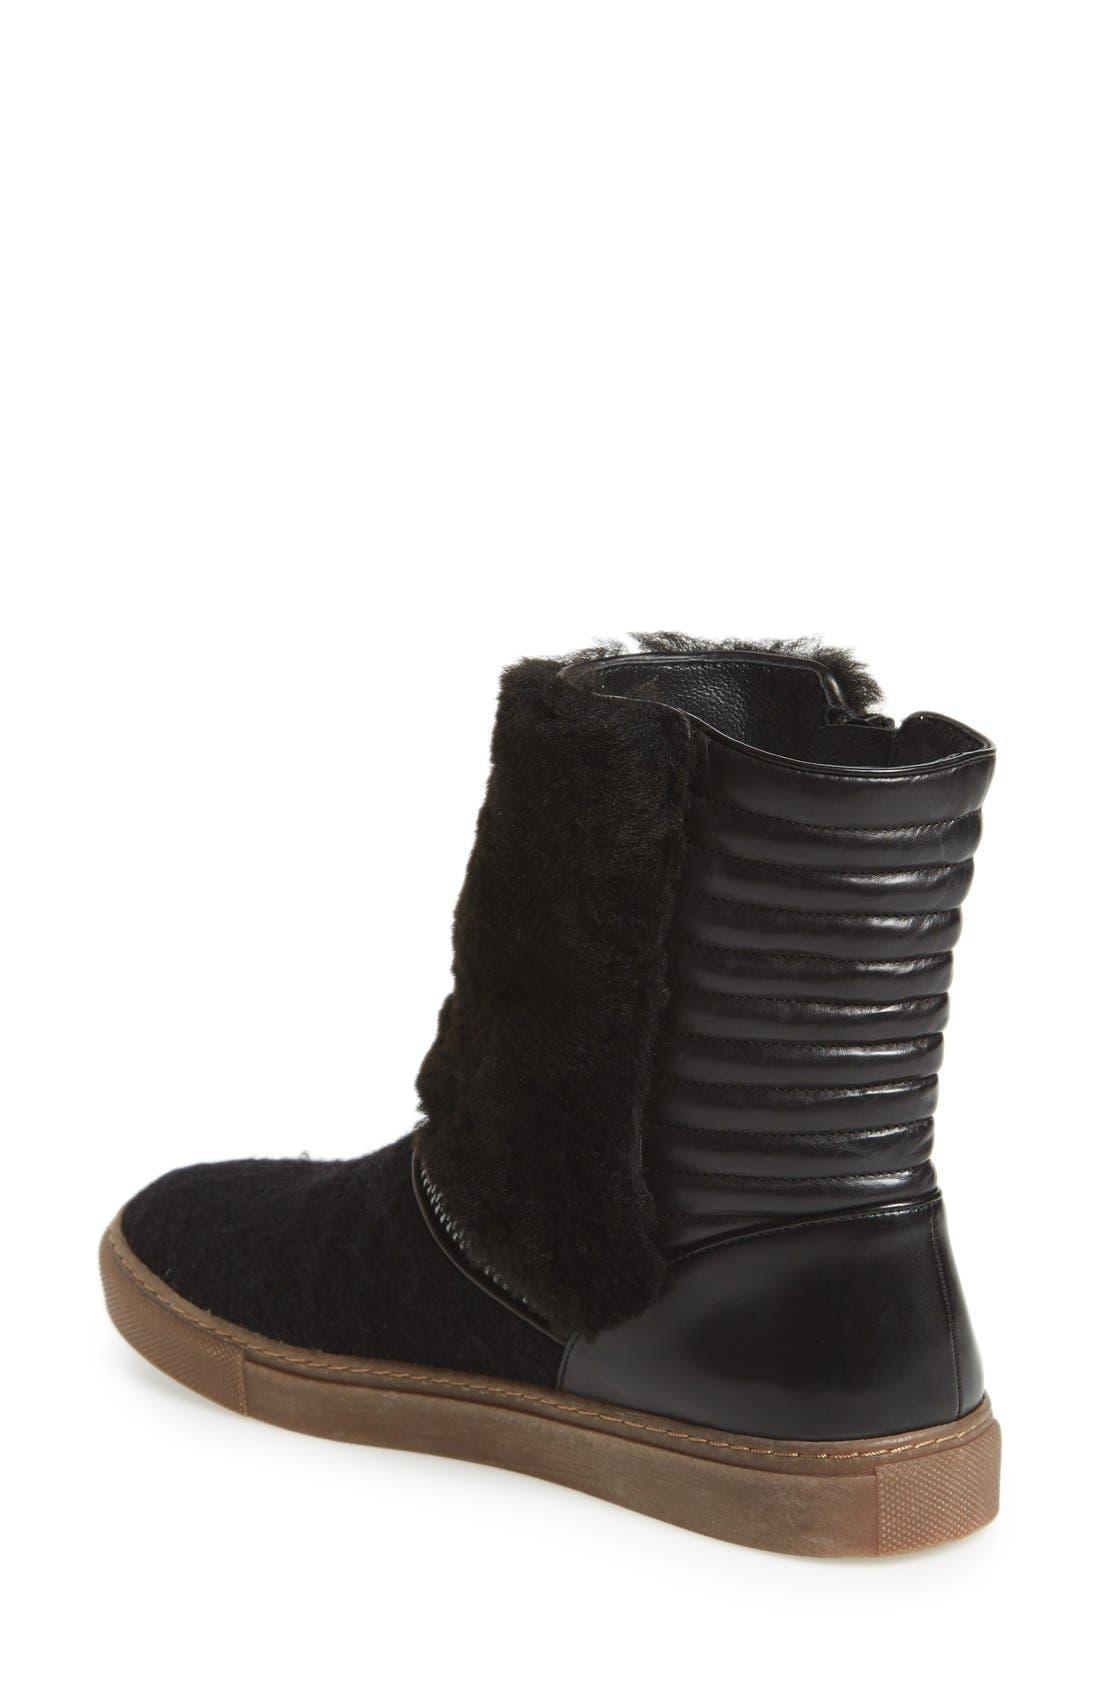 Alternate Image 2  - ElieTahari'Vala' Boot (Women)